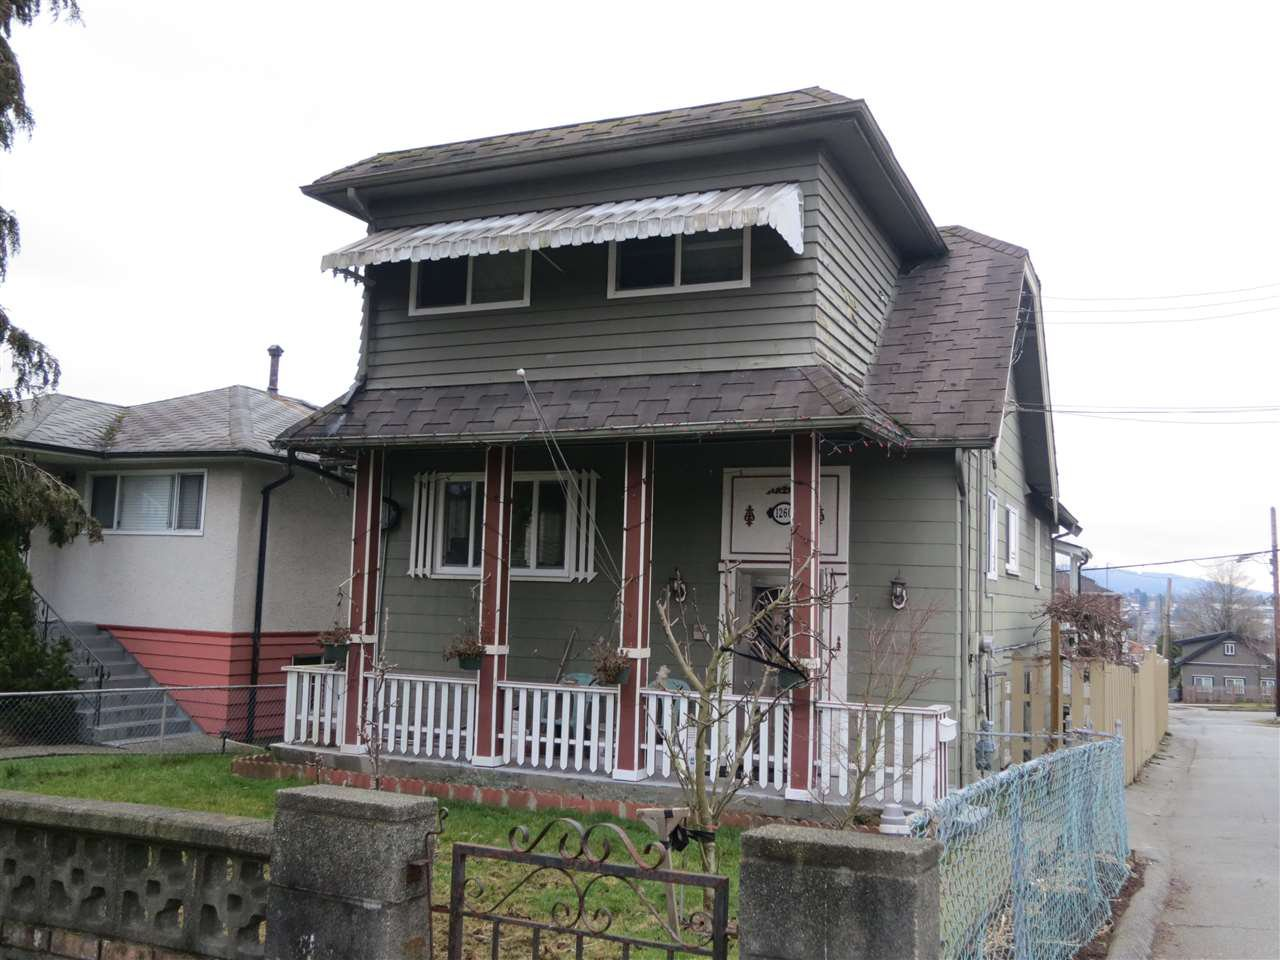 Main Photo: 1260 NOOTKA STREET in Vancouver: Renfrew VE House for sale (Vancouver East)  : MLS®# R2027888